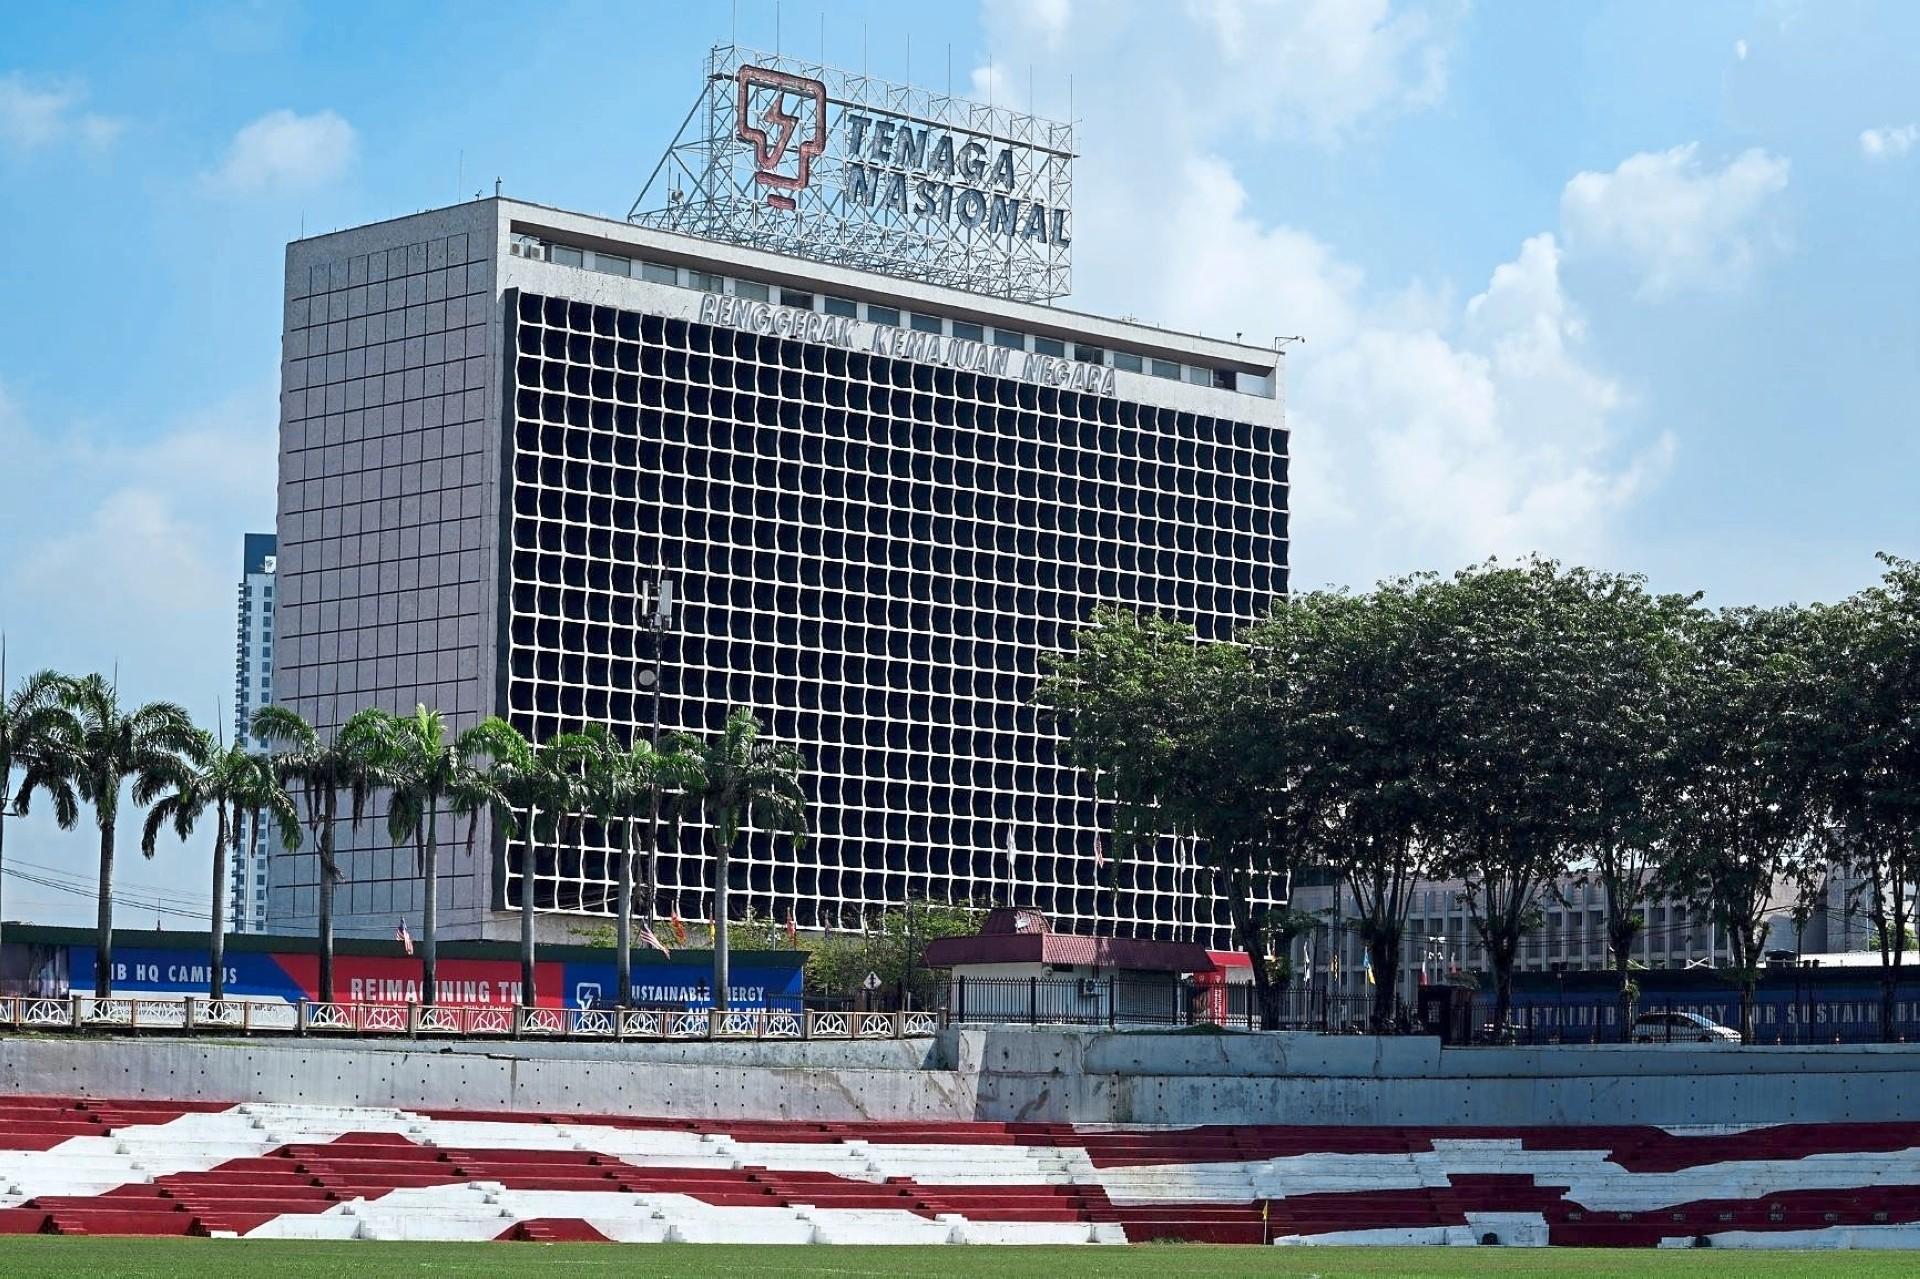 The TNB headquarters in Bangsar, Kuala Lumpur.